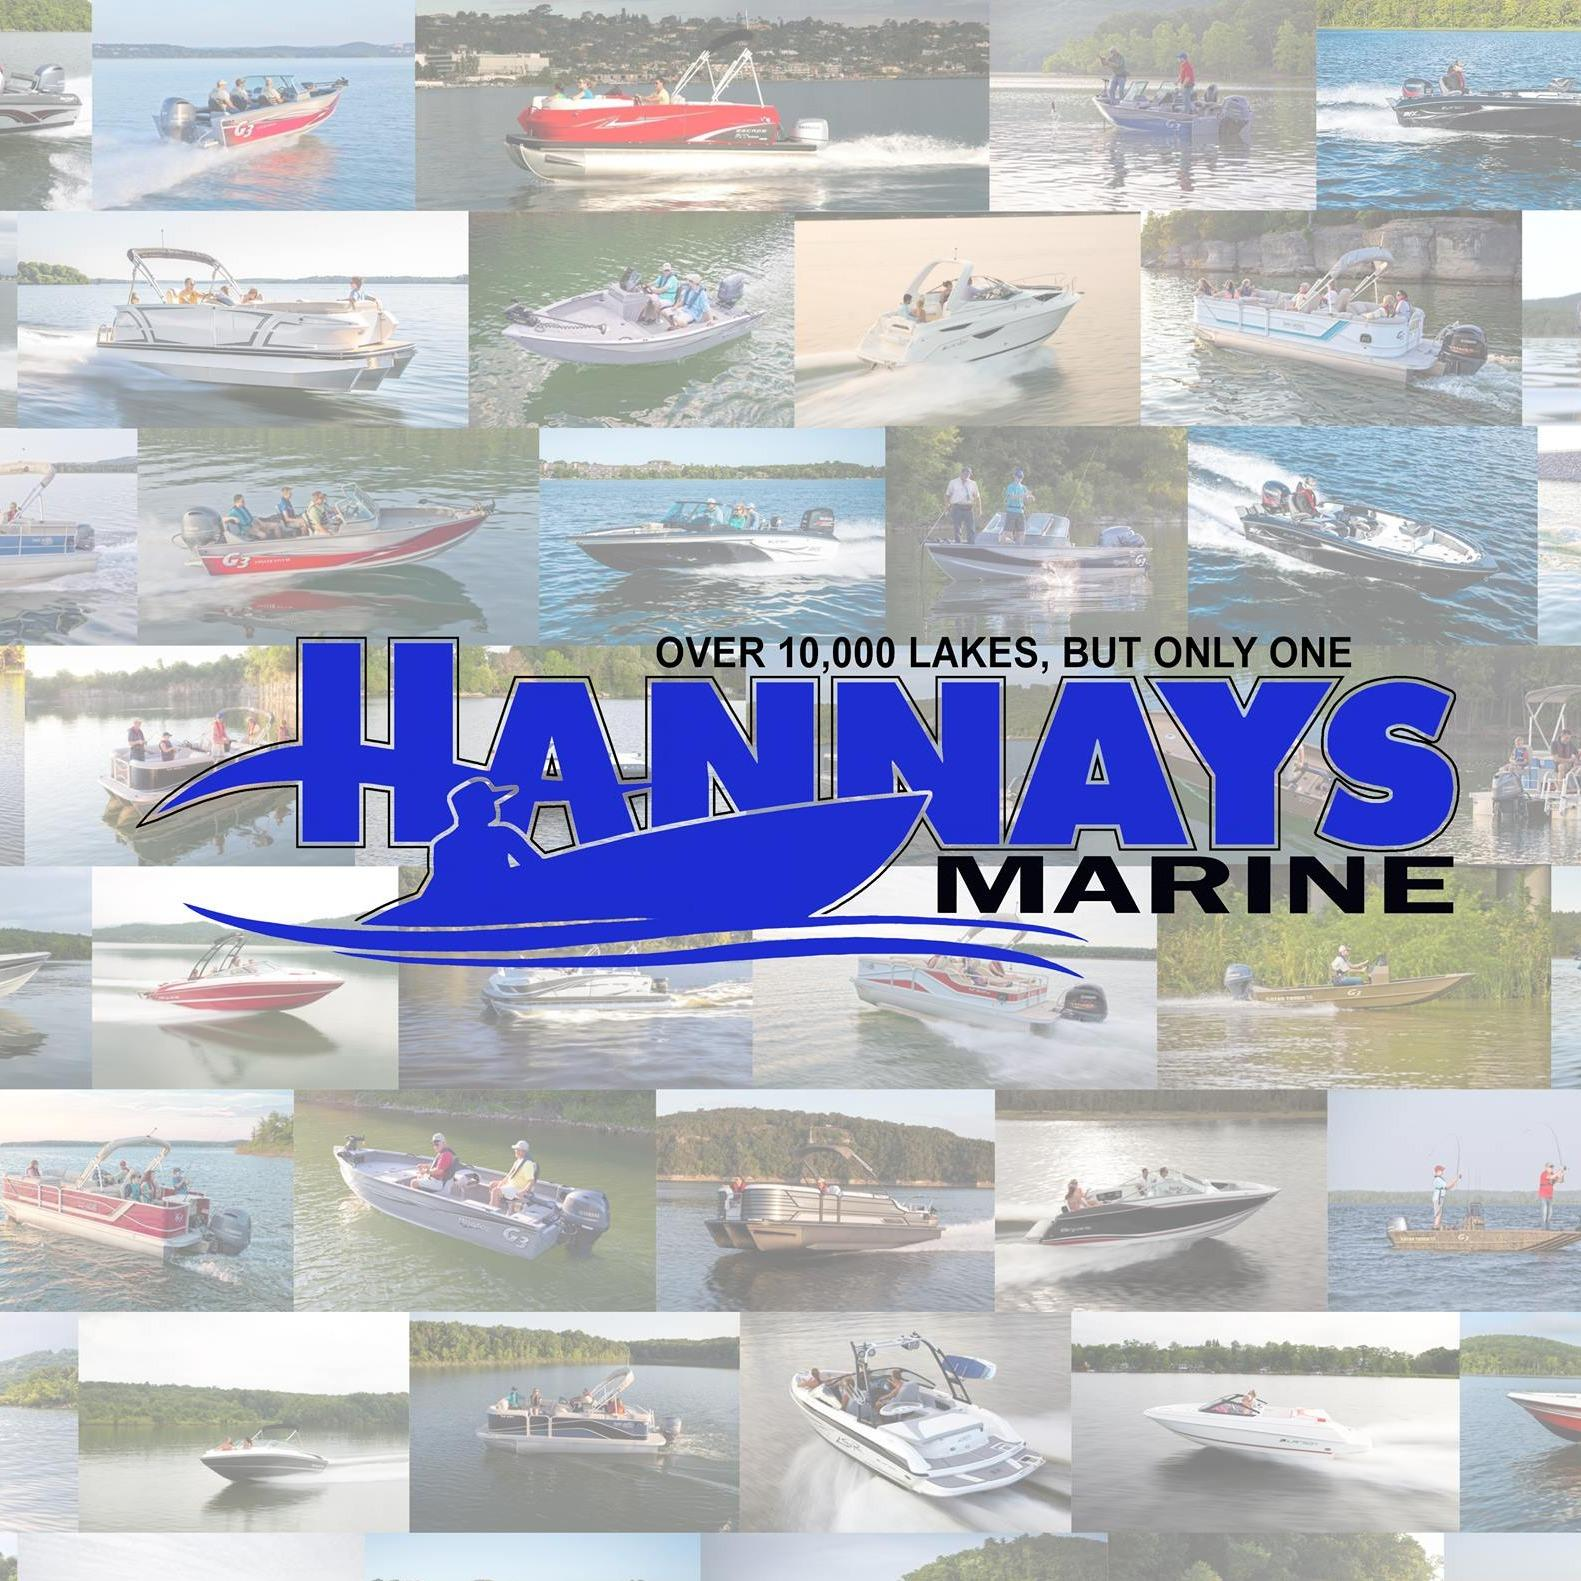 Hannay's Marine